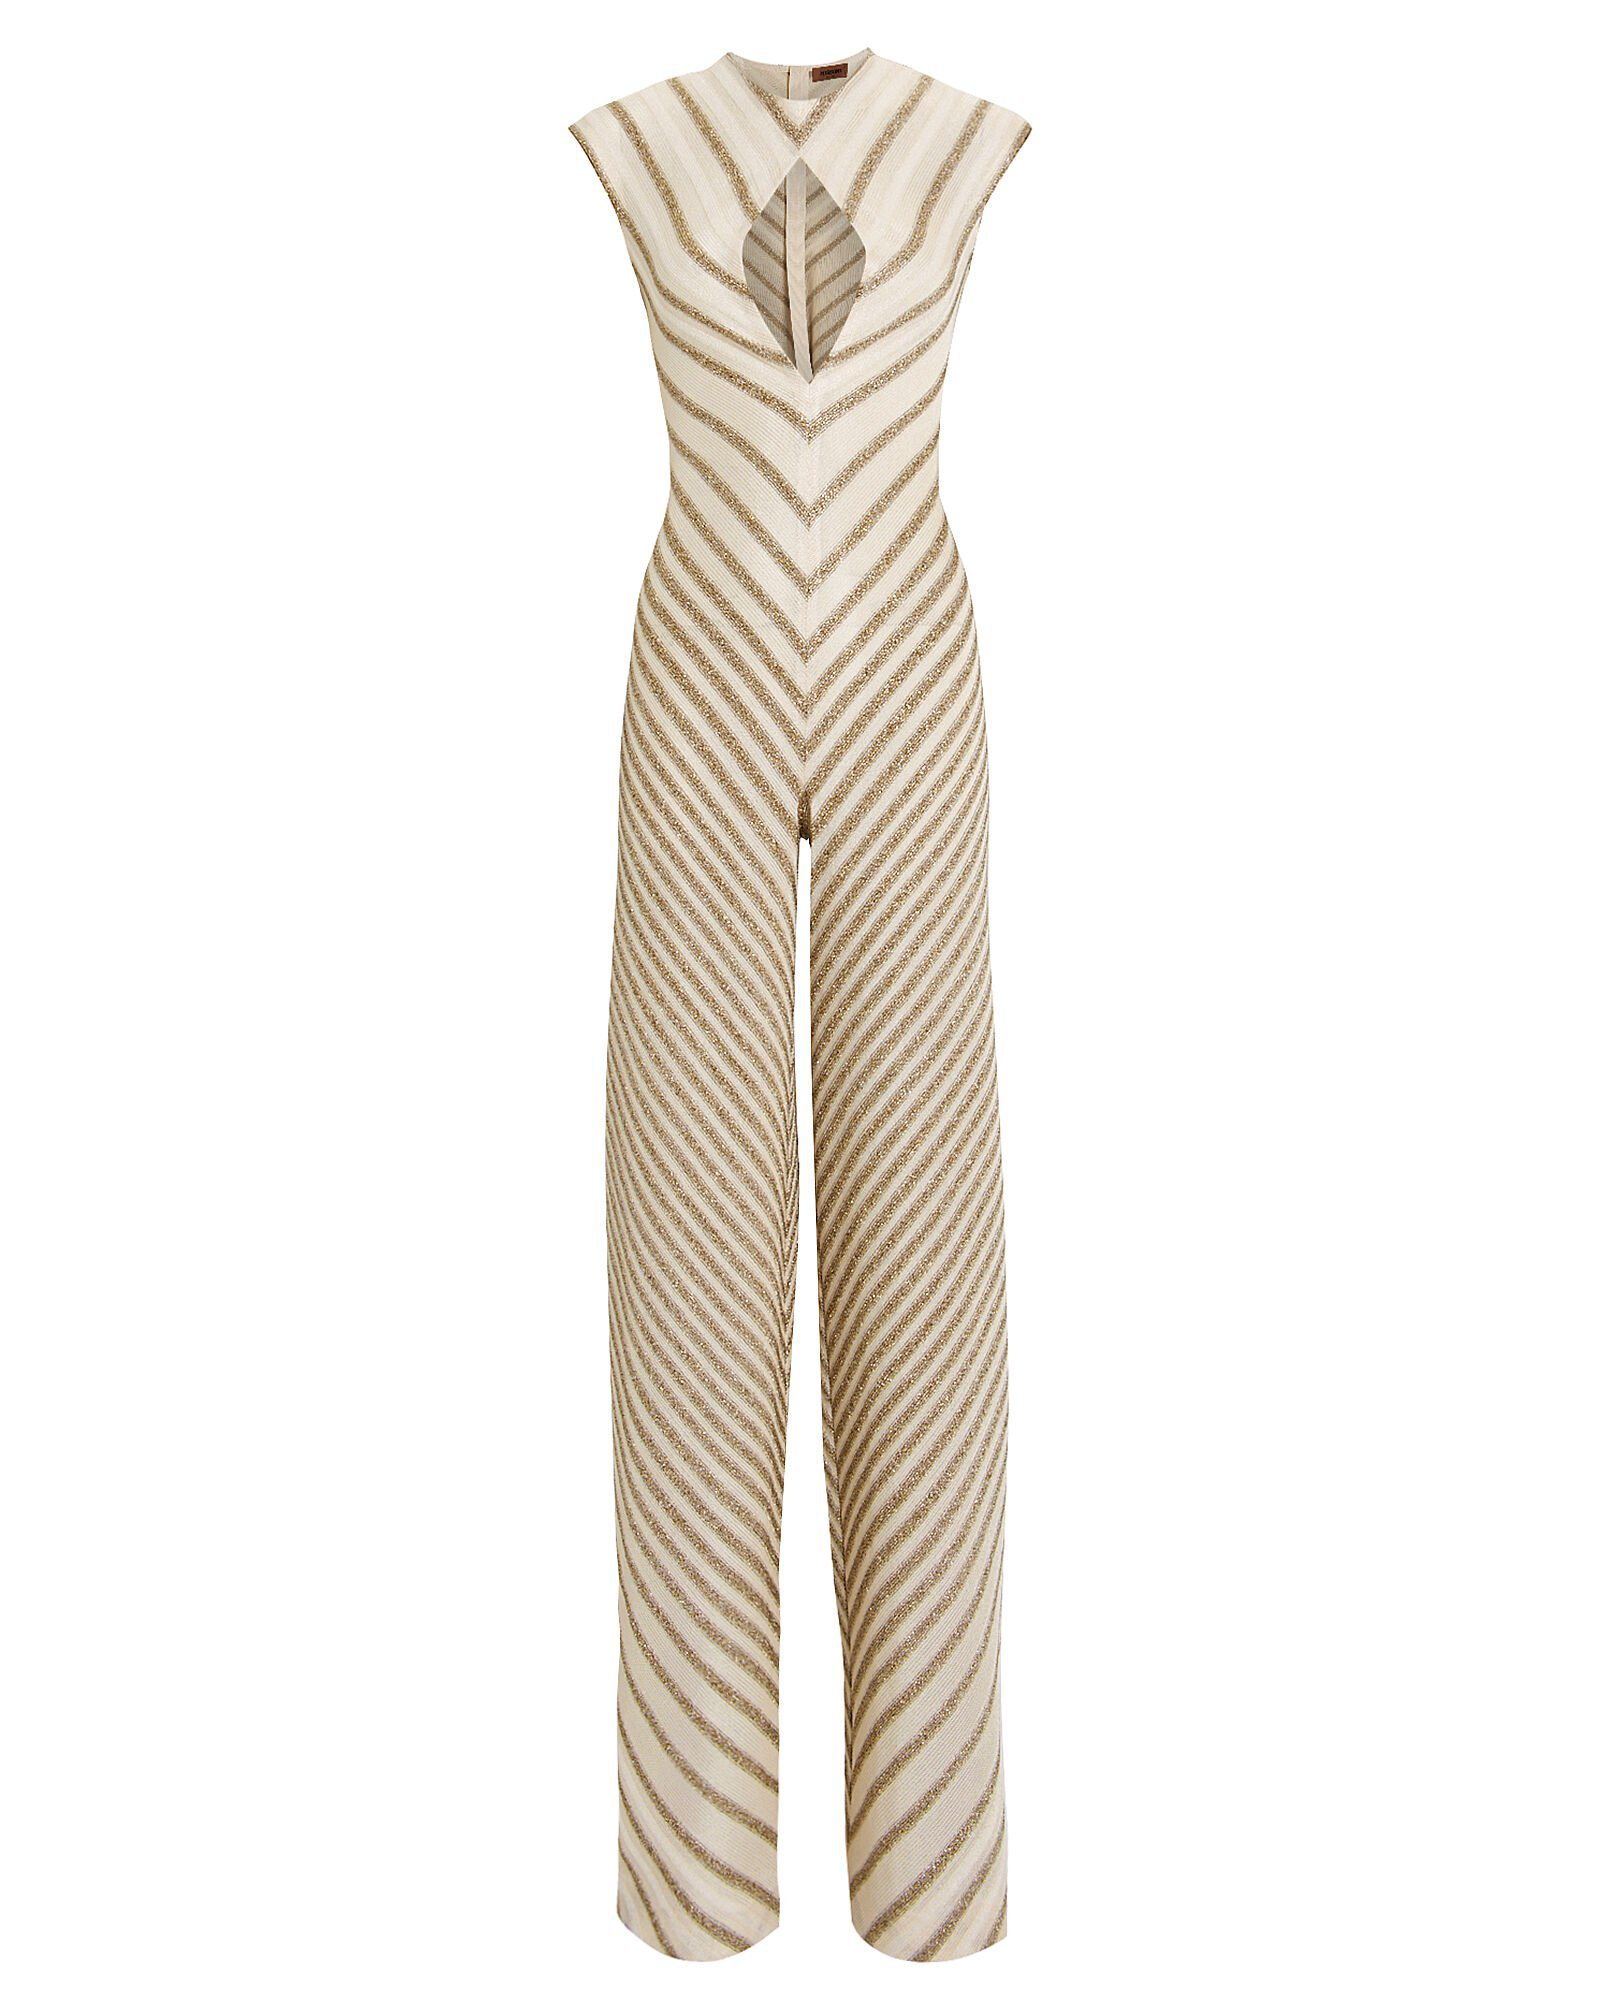 Gold Striped Cut-Out Jumpsuit